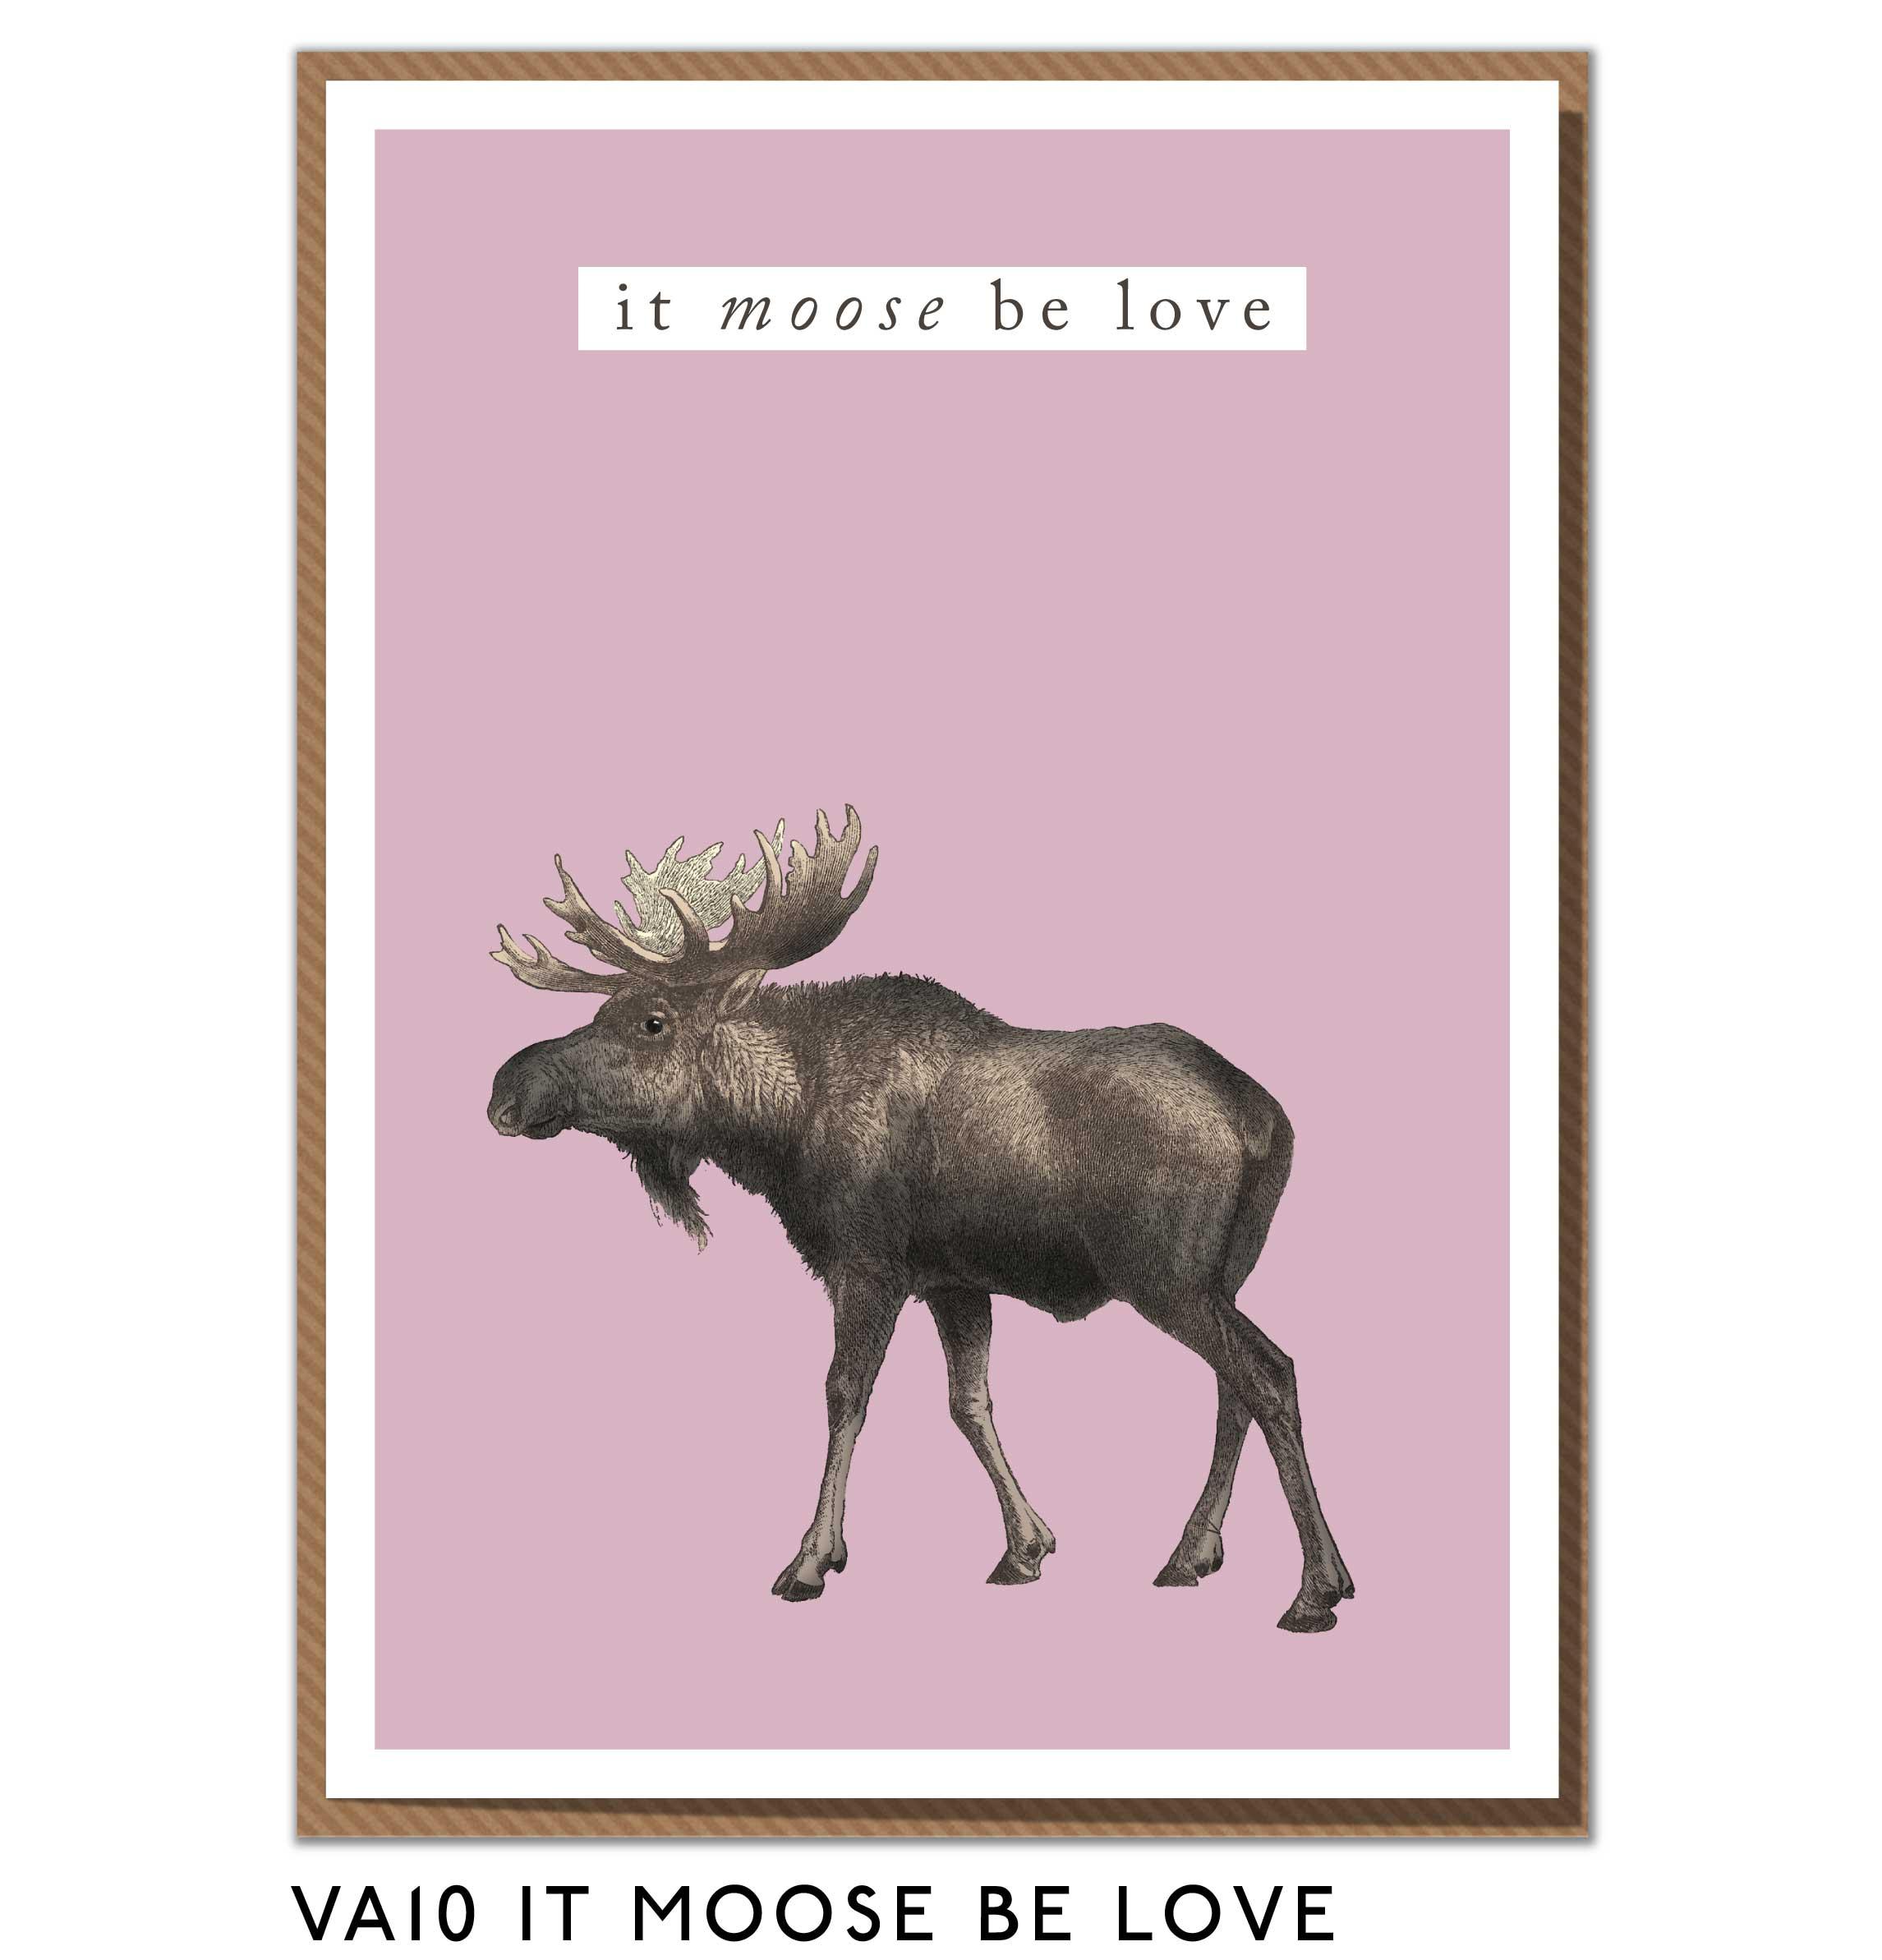 VA10-IT-MOOSE-BE-LOVE.jpg